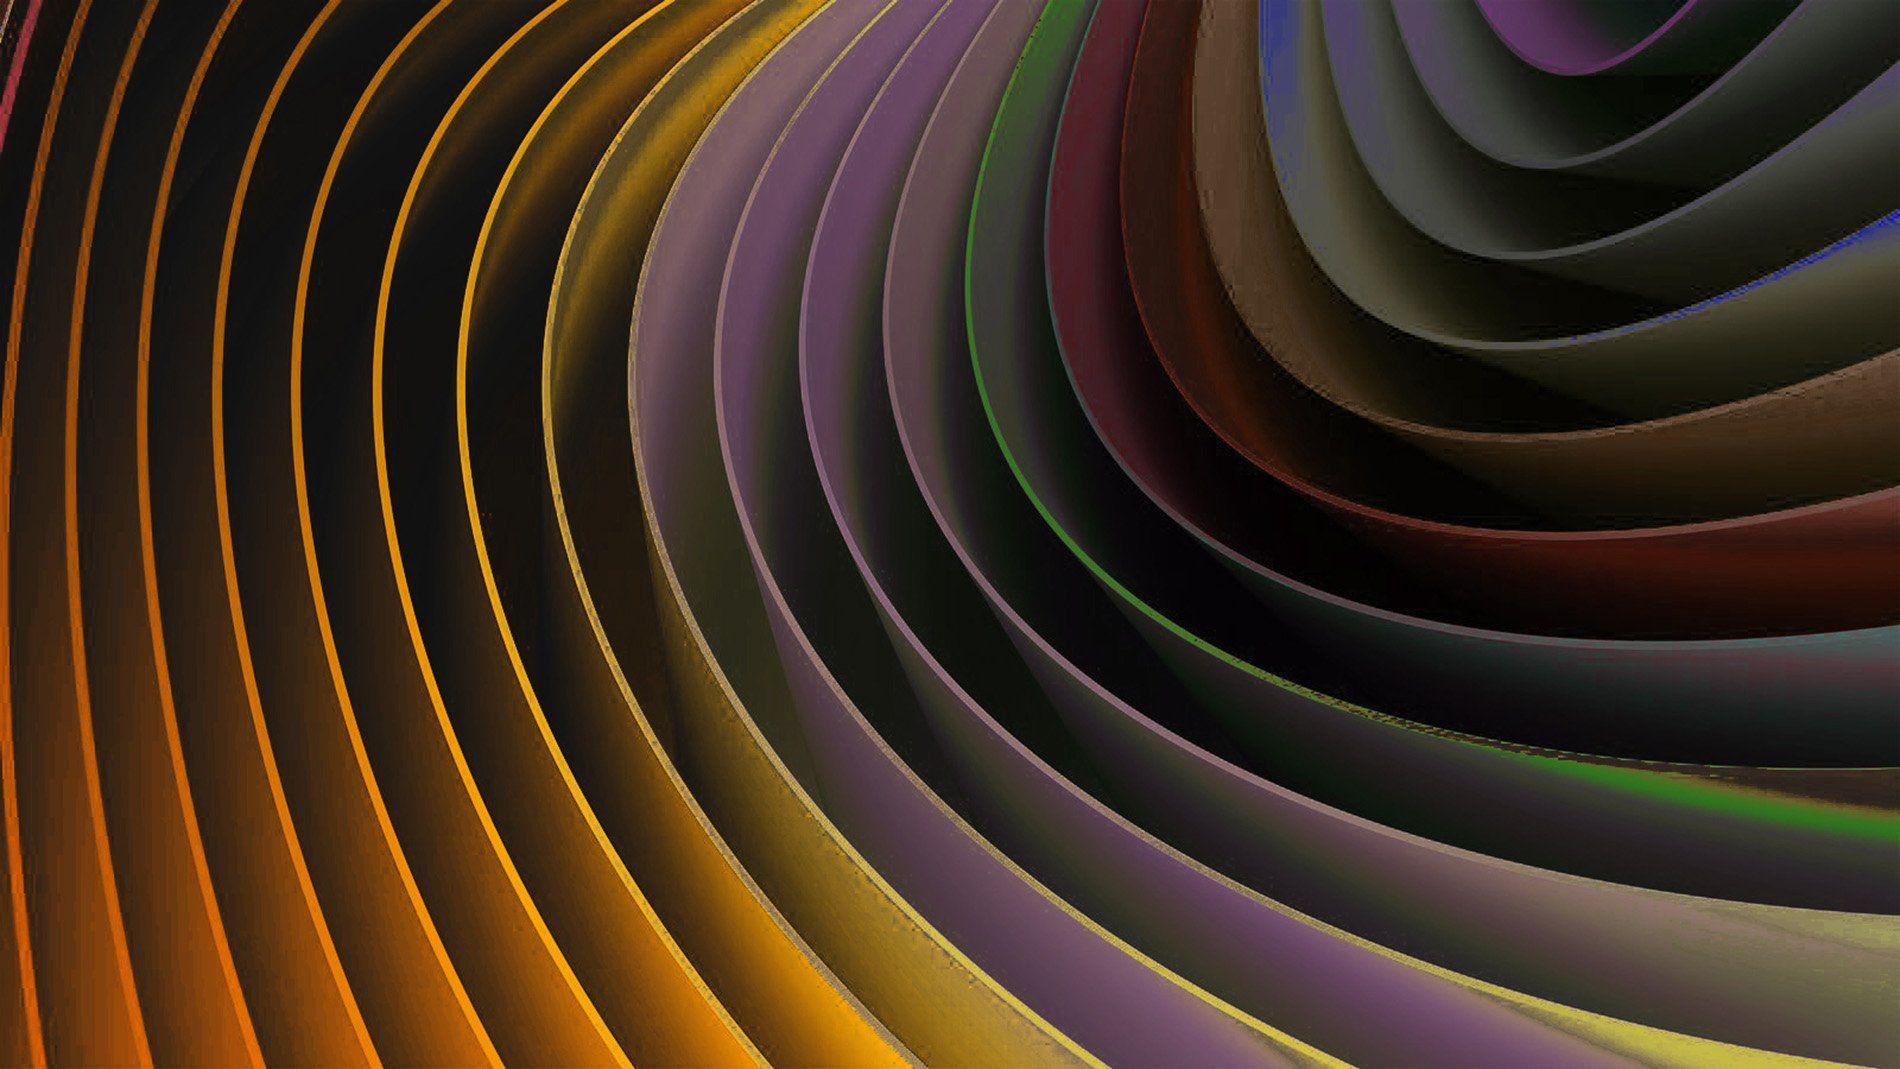 #abstract #abstractart #abstractpainting #abstraction #abstractexpressionism #abstractartist #abstracto #abstractphotography #abstractphoto #abstracts